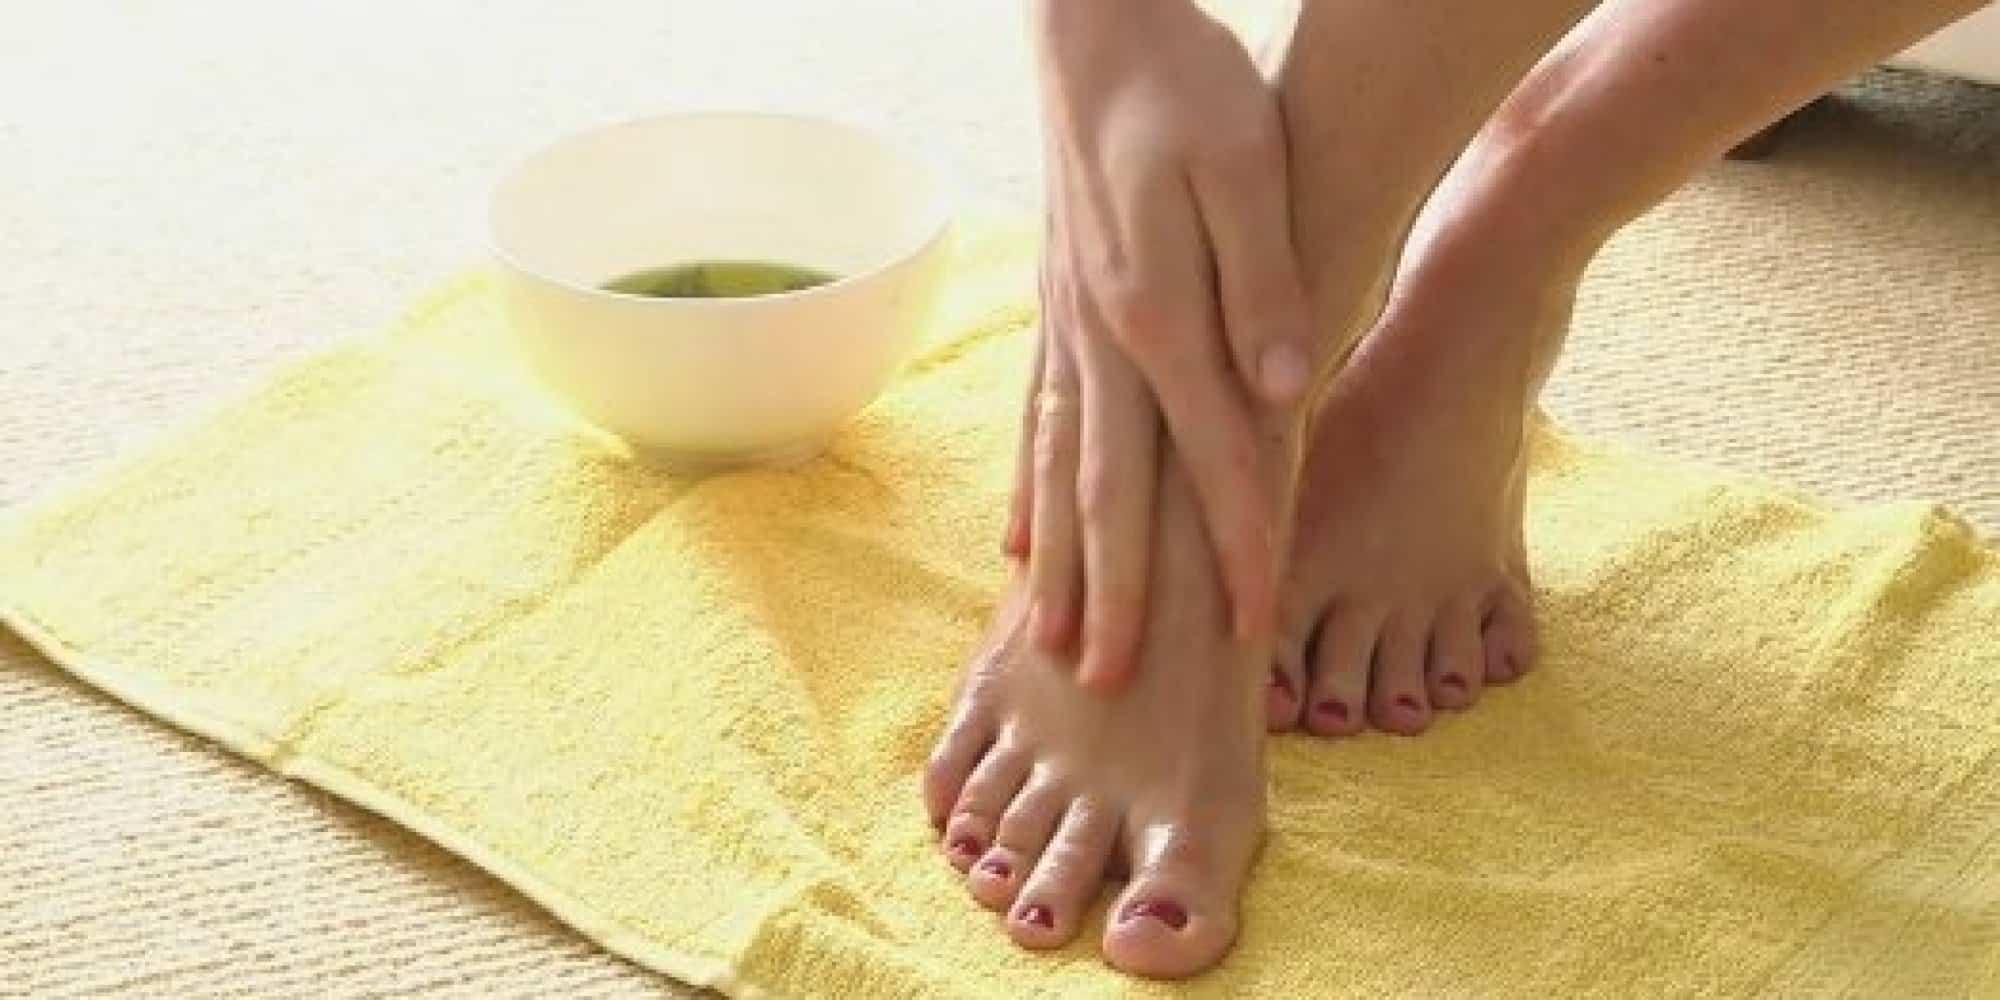 Camphor and honey foot scrub